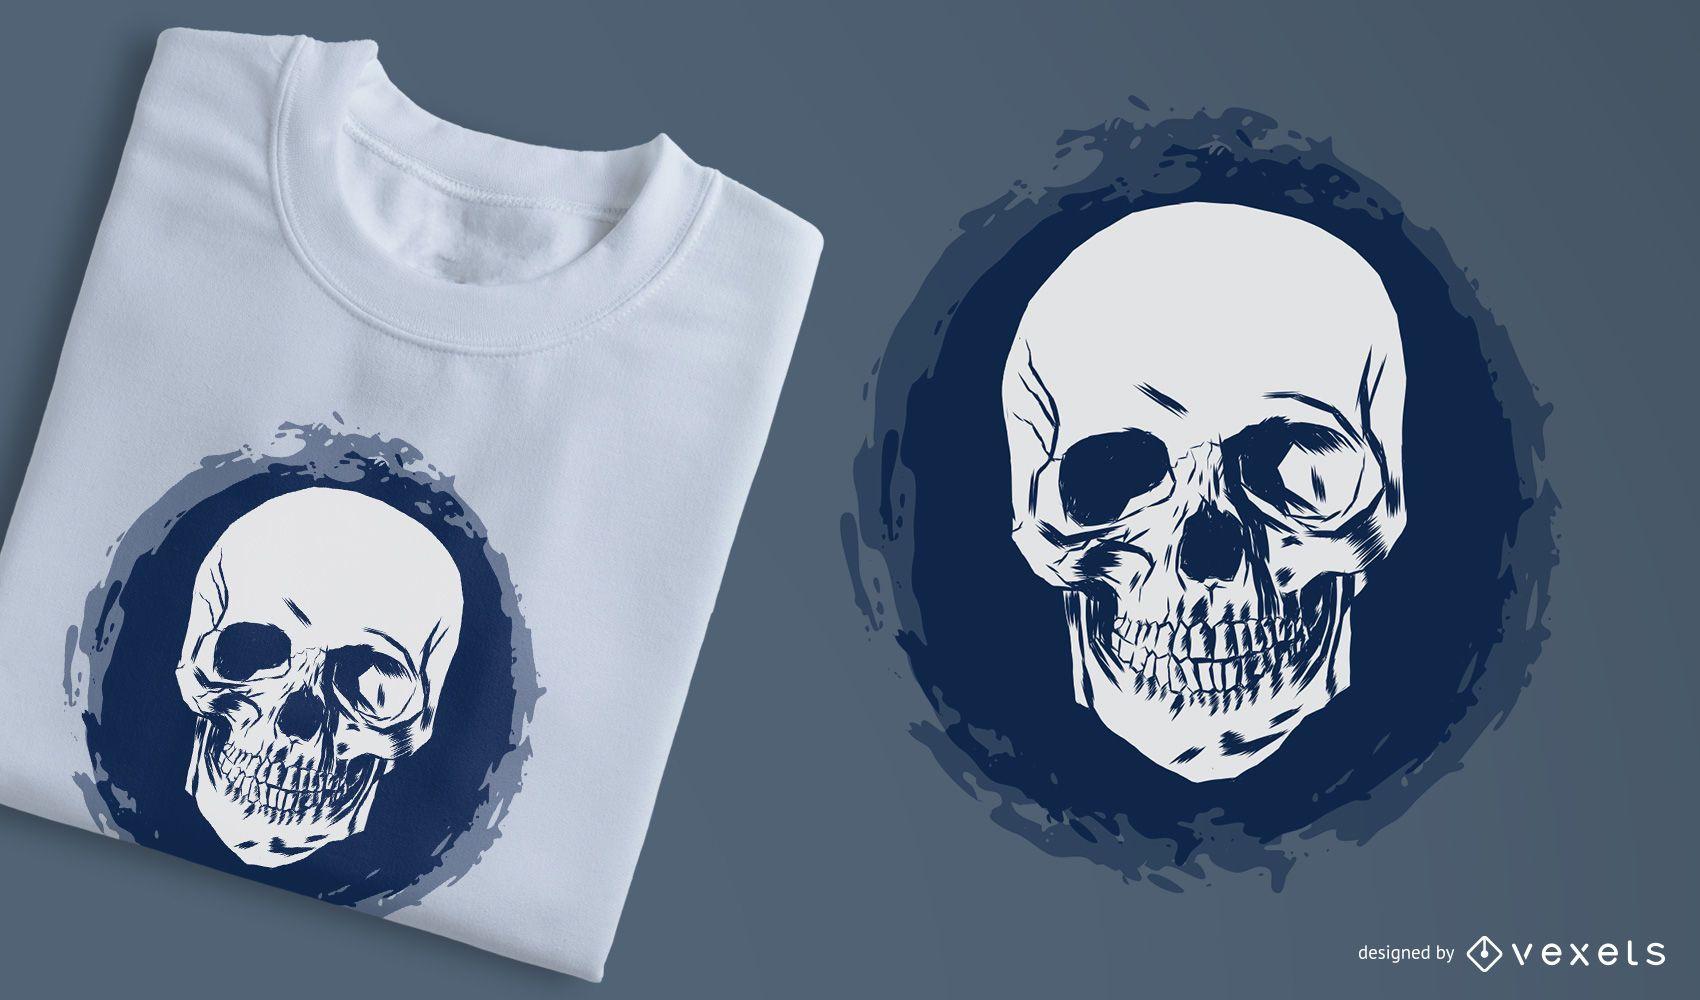 Sketchy 3 Faces Skull camiseta